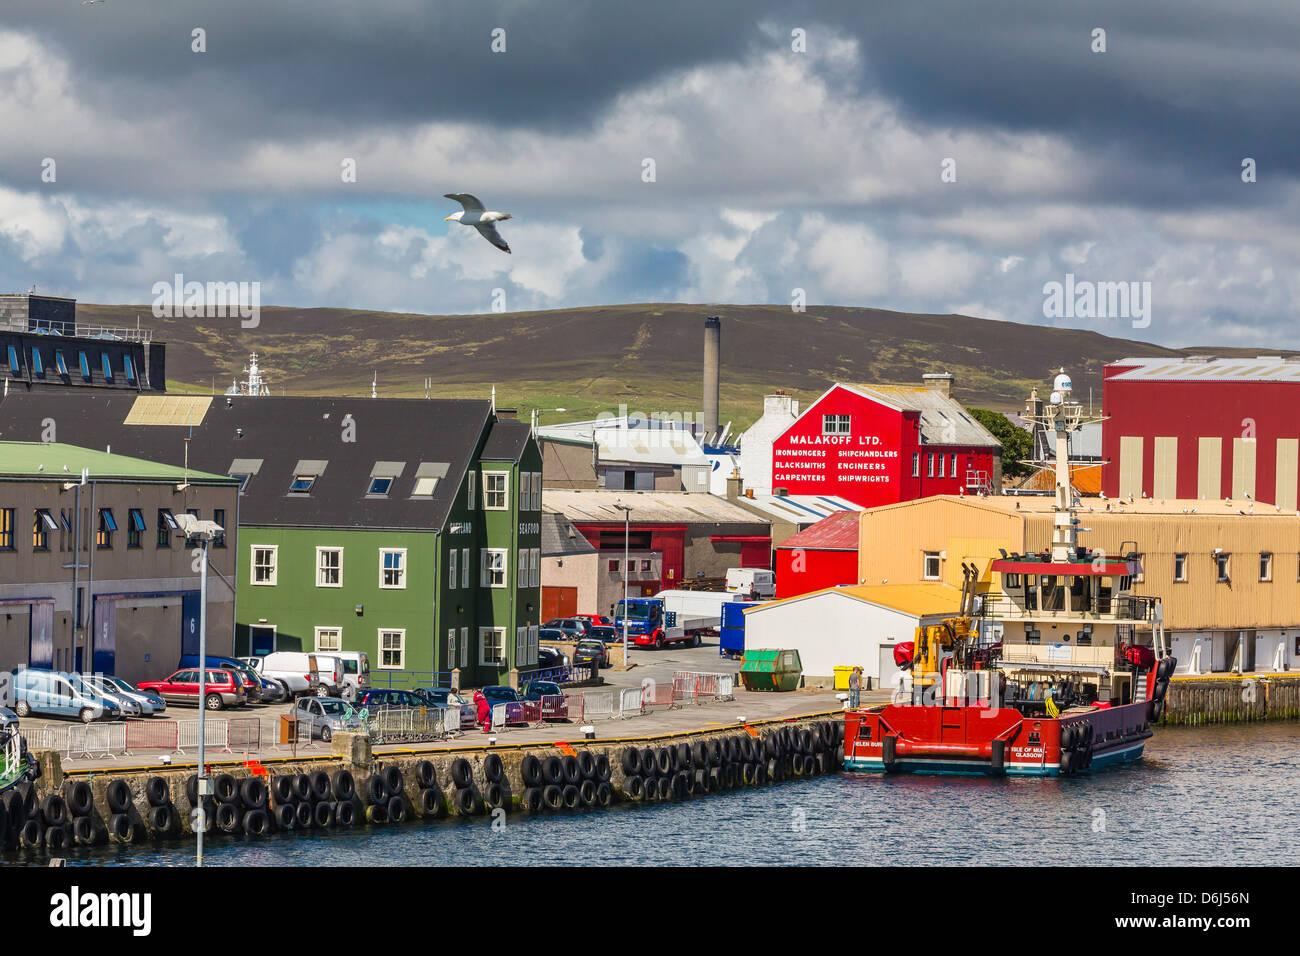 Views of the port of Lerwick, Shetland Islands, Scotland, United Kingdom, Europe - Stock Image